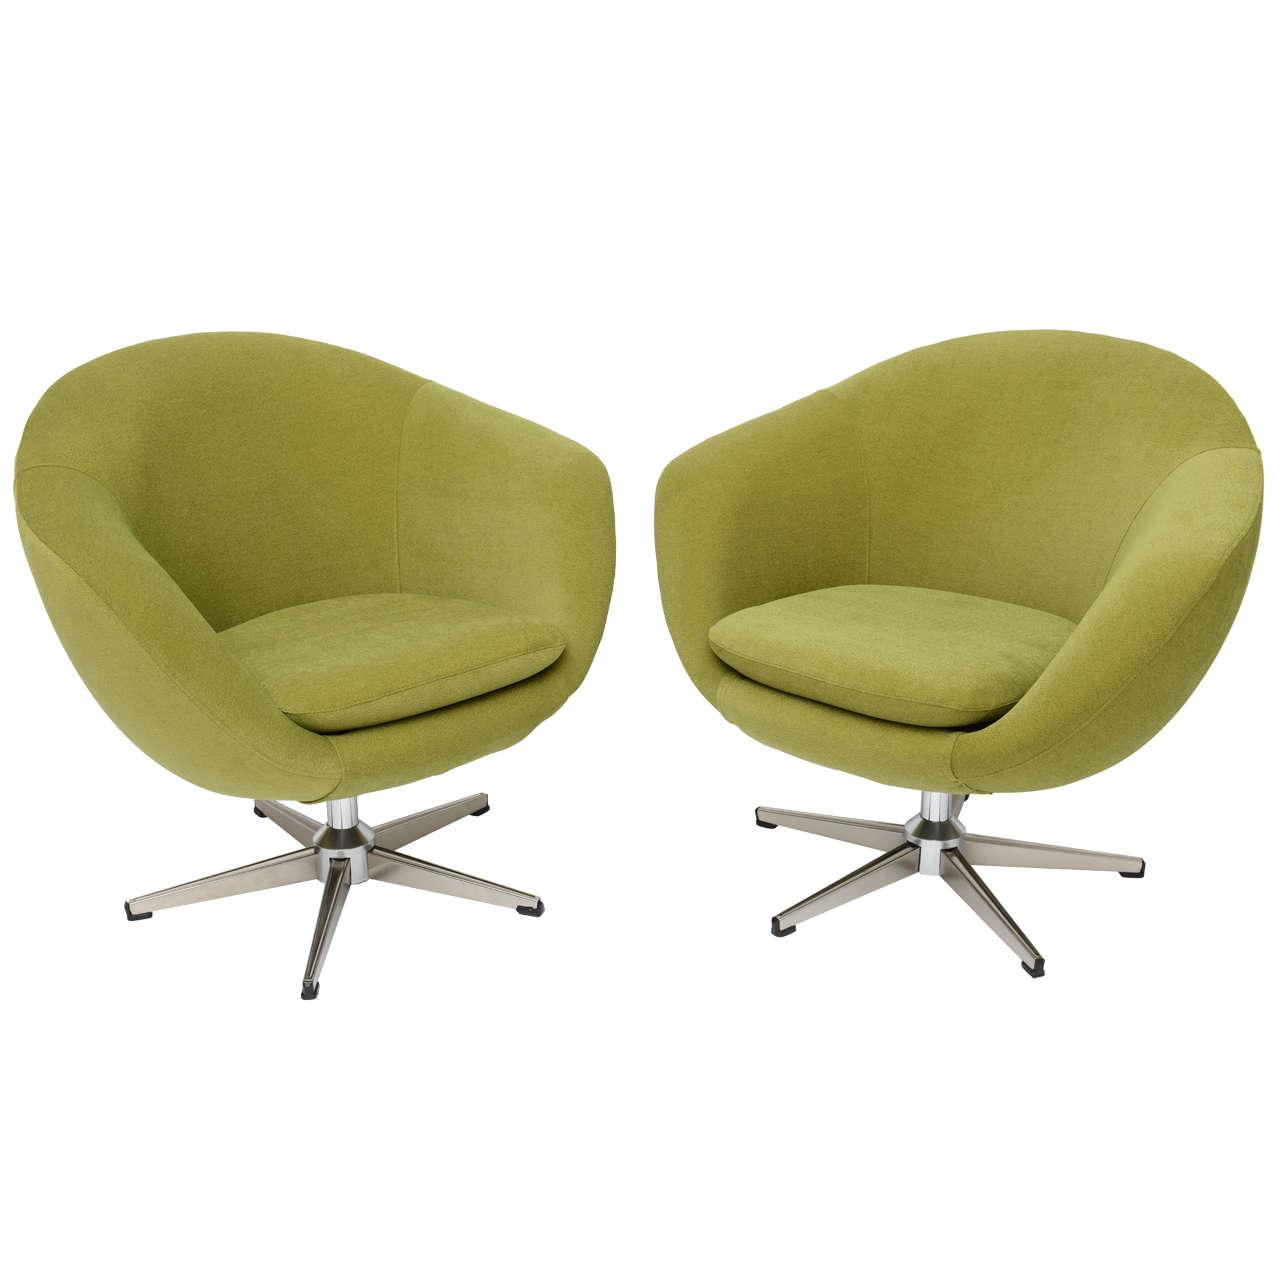 Clic Swedish Overman Swivel Egg Chairs For